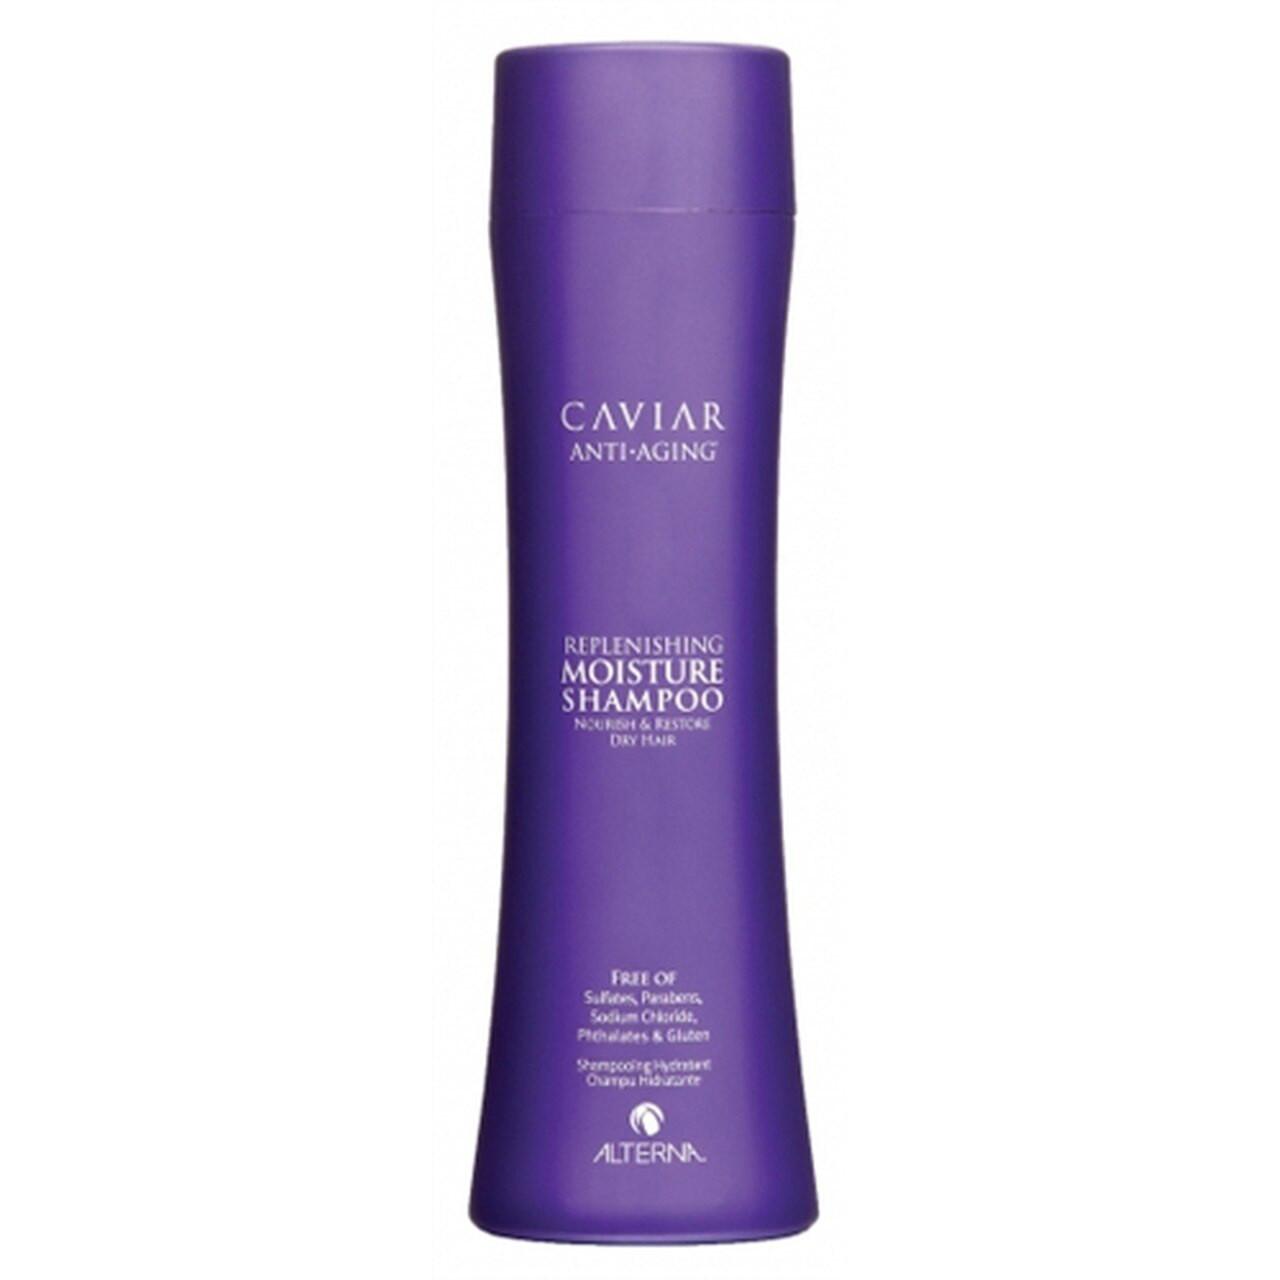 Alterna Caviar Replenishing Moisture Shampoo